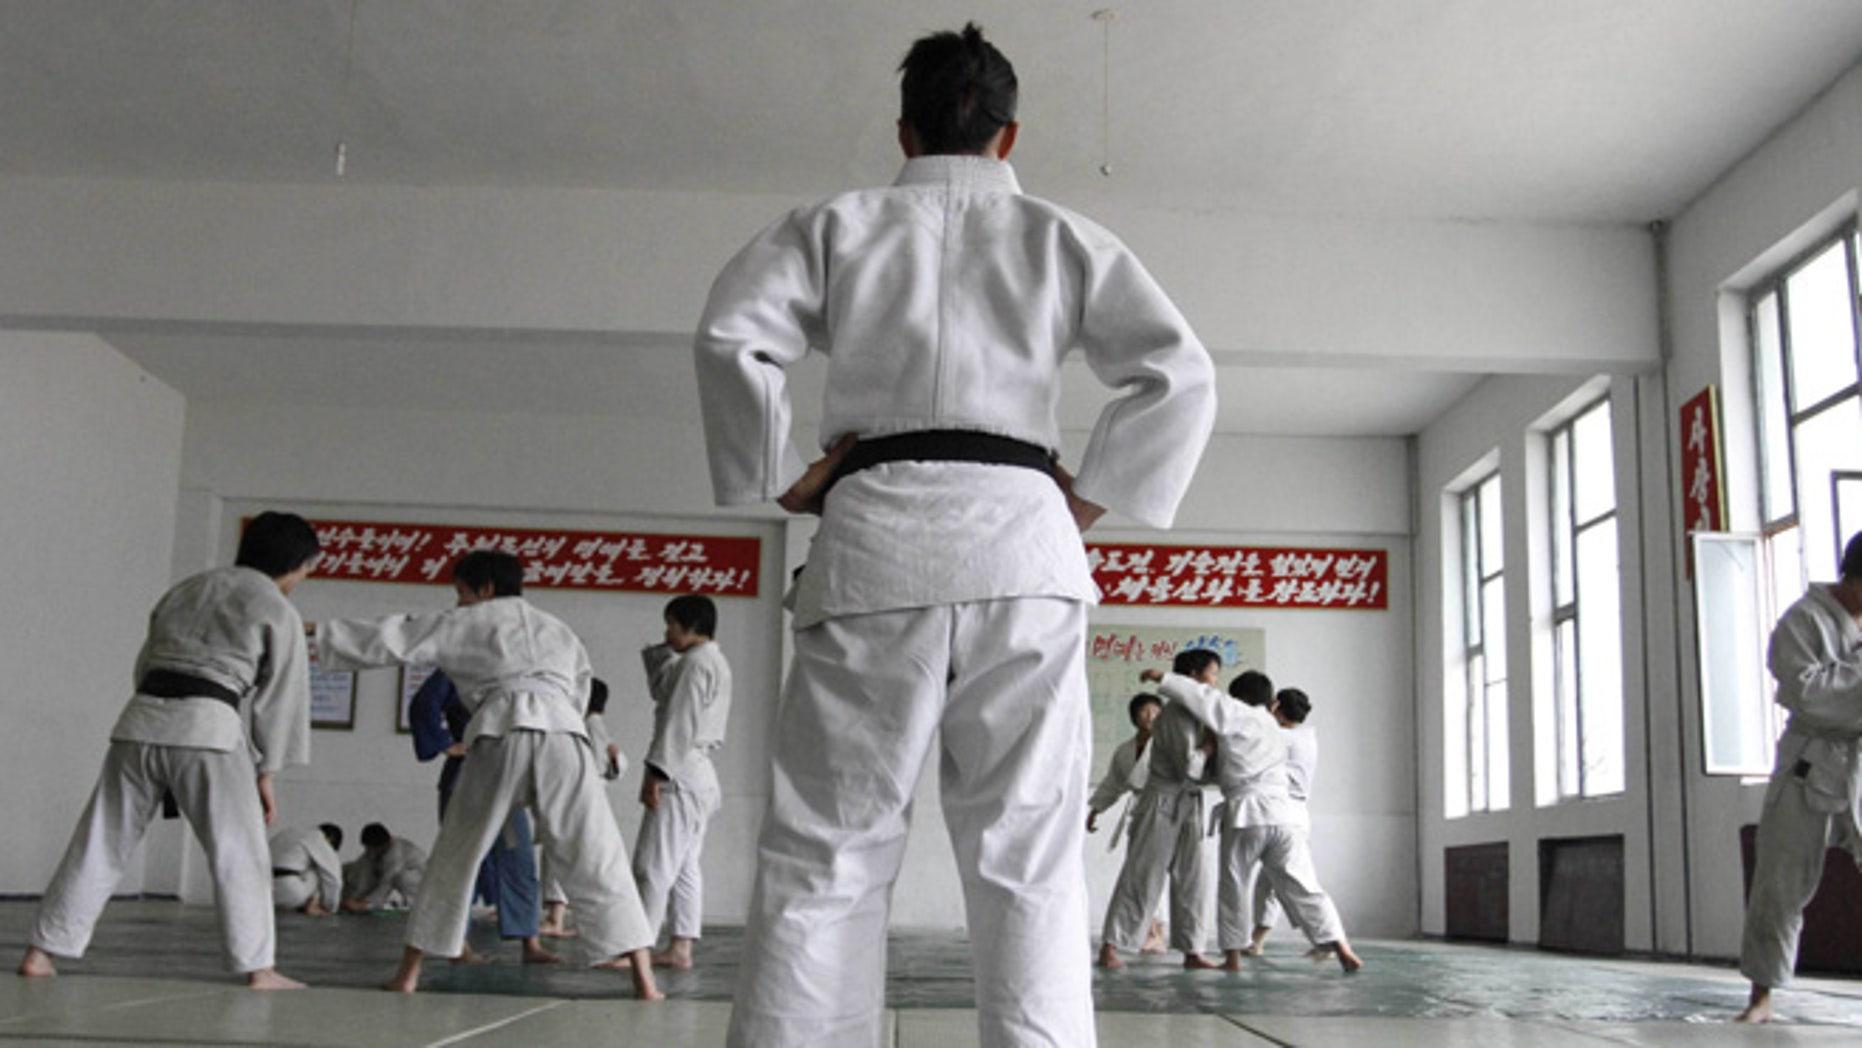 June 22, 2012: In this photo, North Korean judo coach Kye Sun Hui, center, trains players in Pyongyang, North Korea.